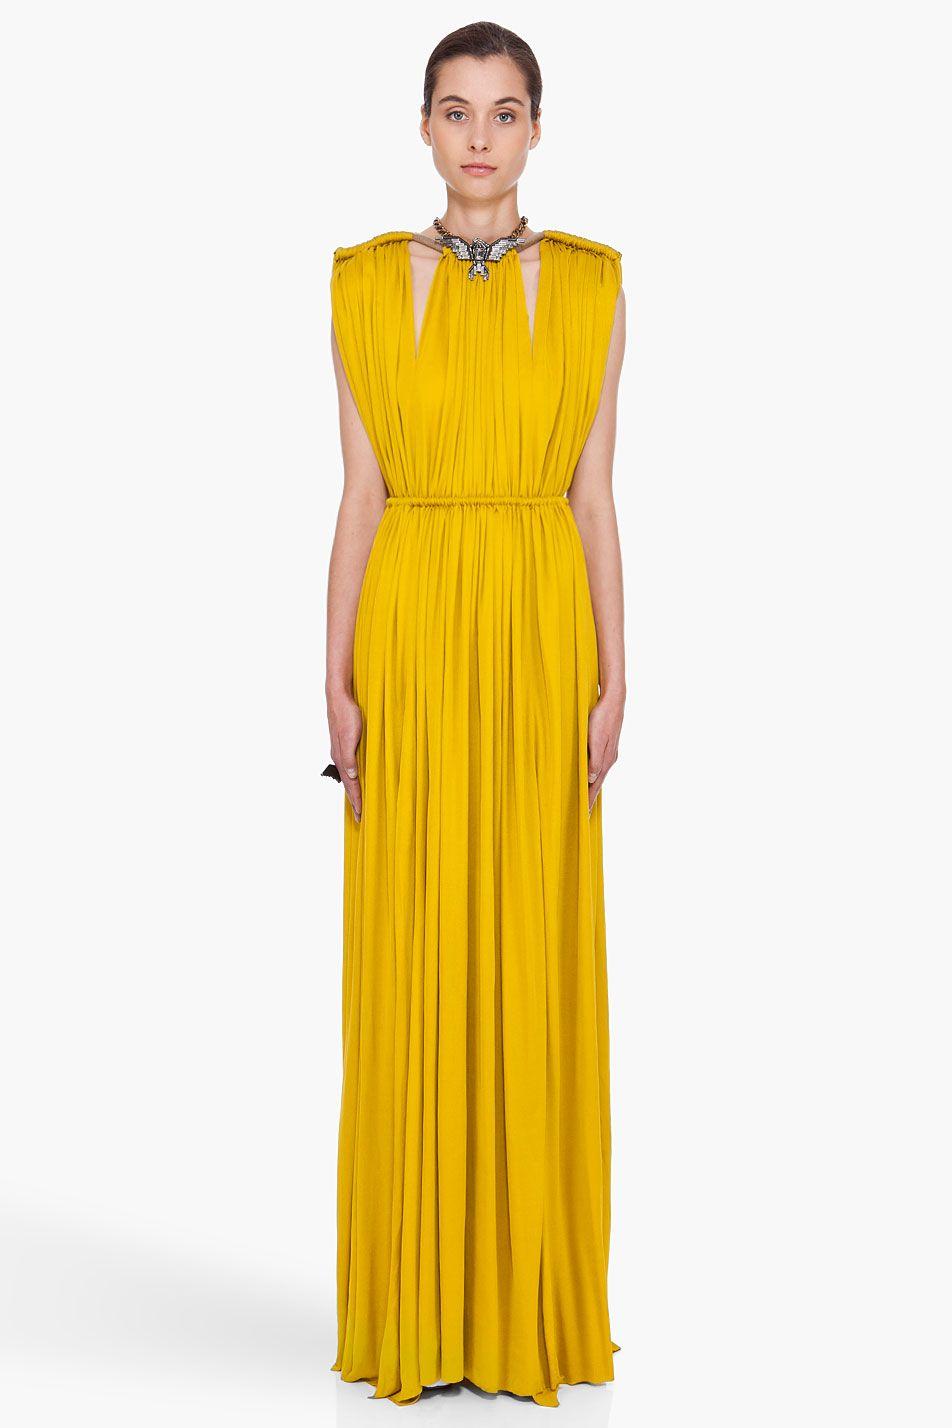 DRESSES - Long dresses Lanvin 7zVsvBr